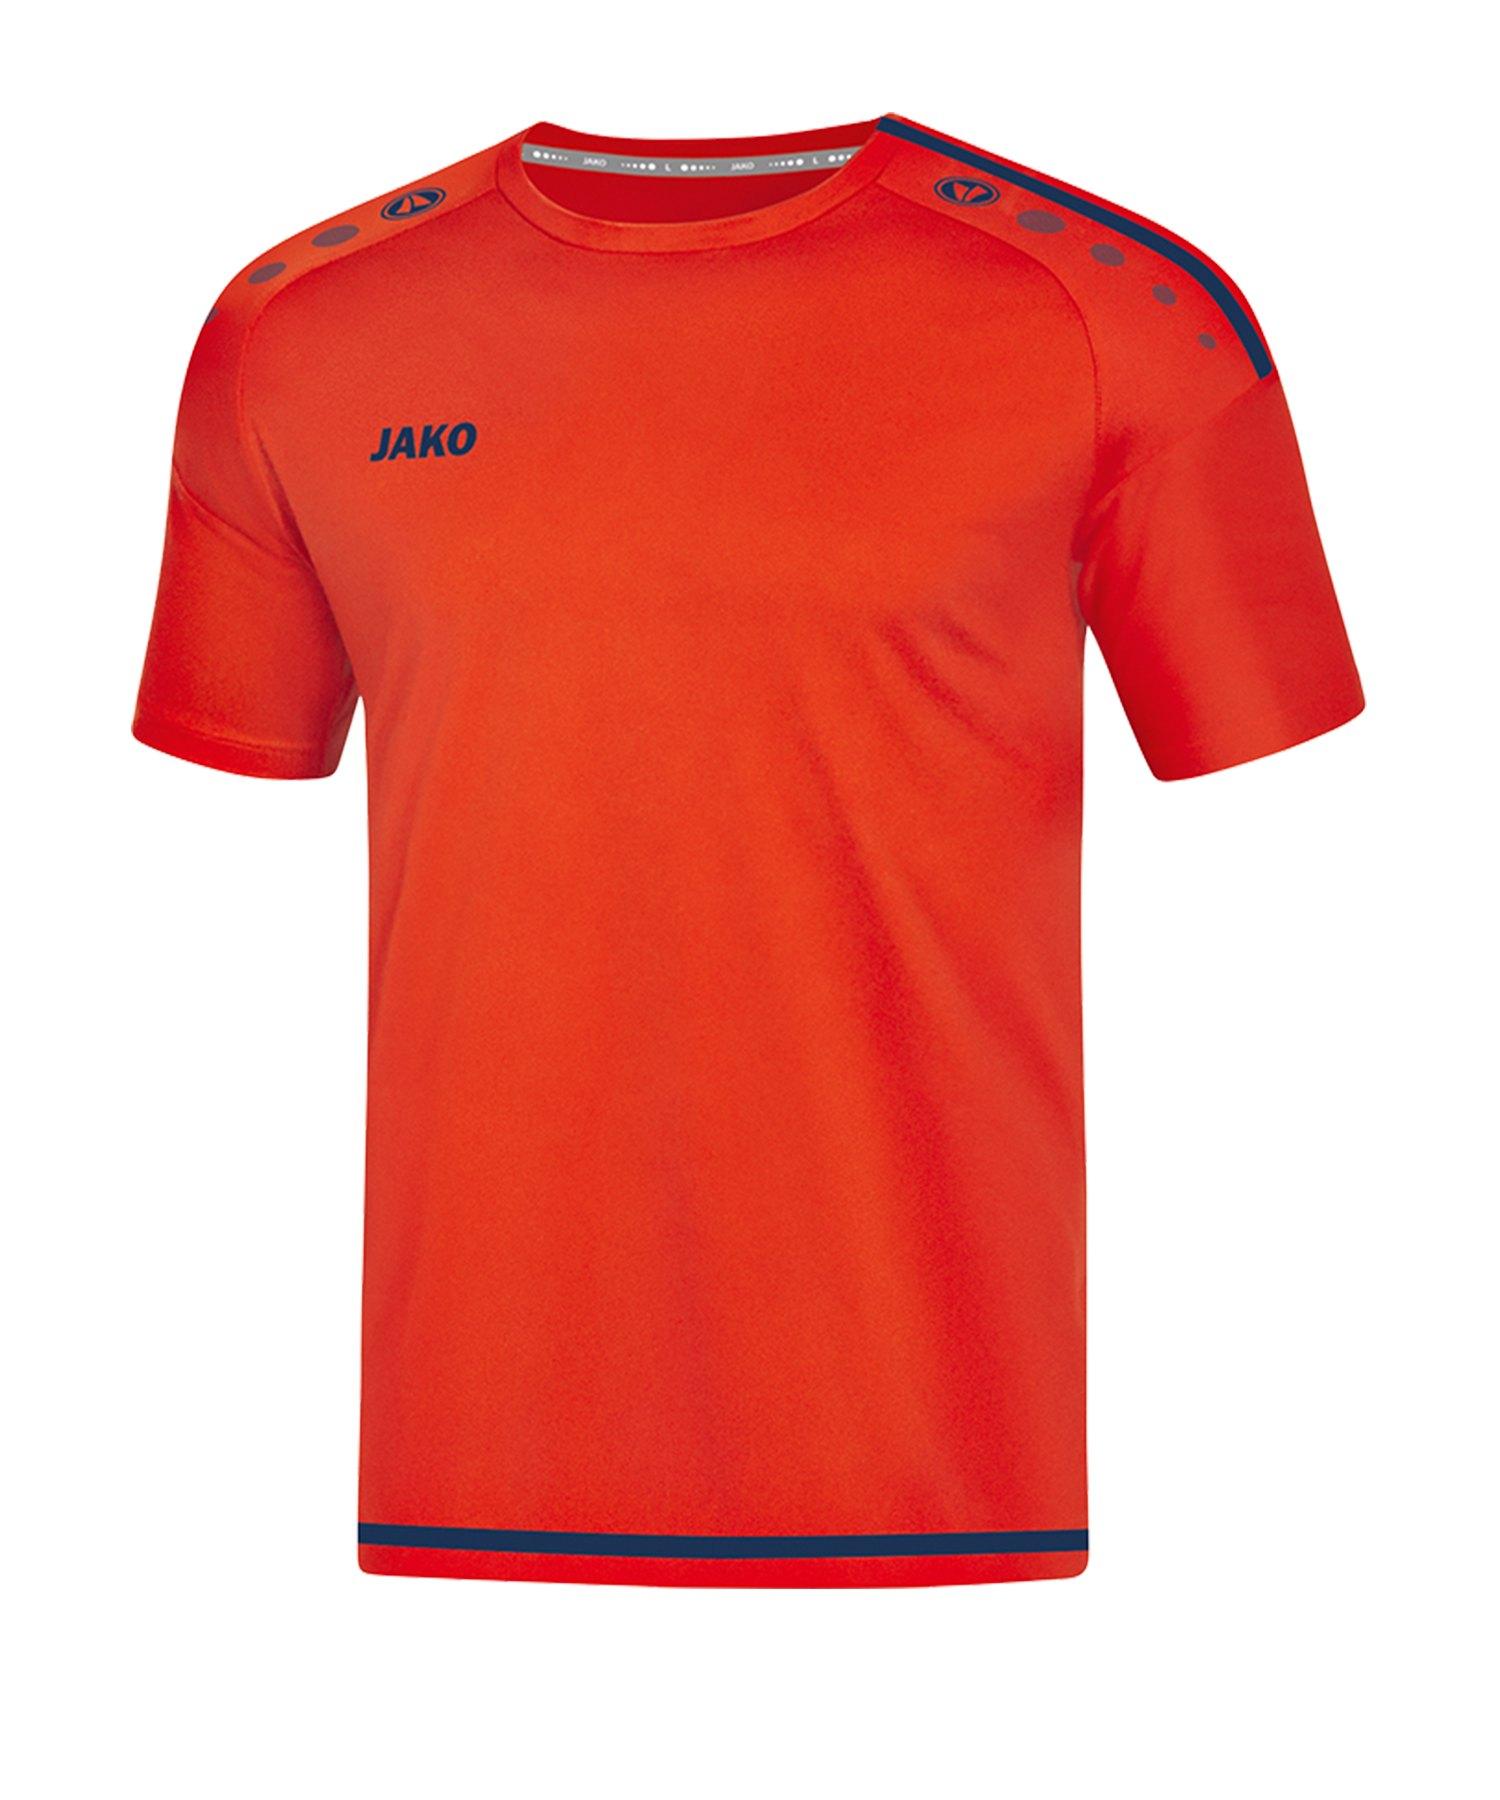 Jako Striker 2.0 Trikot kurzarm Orange Blau F18 - Orange